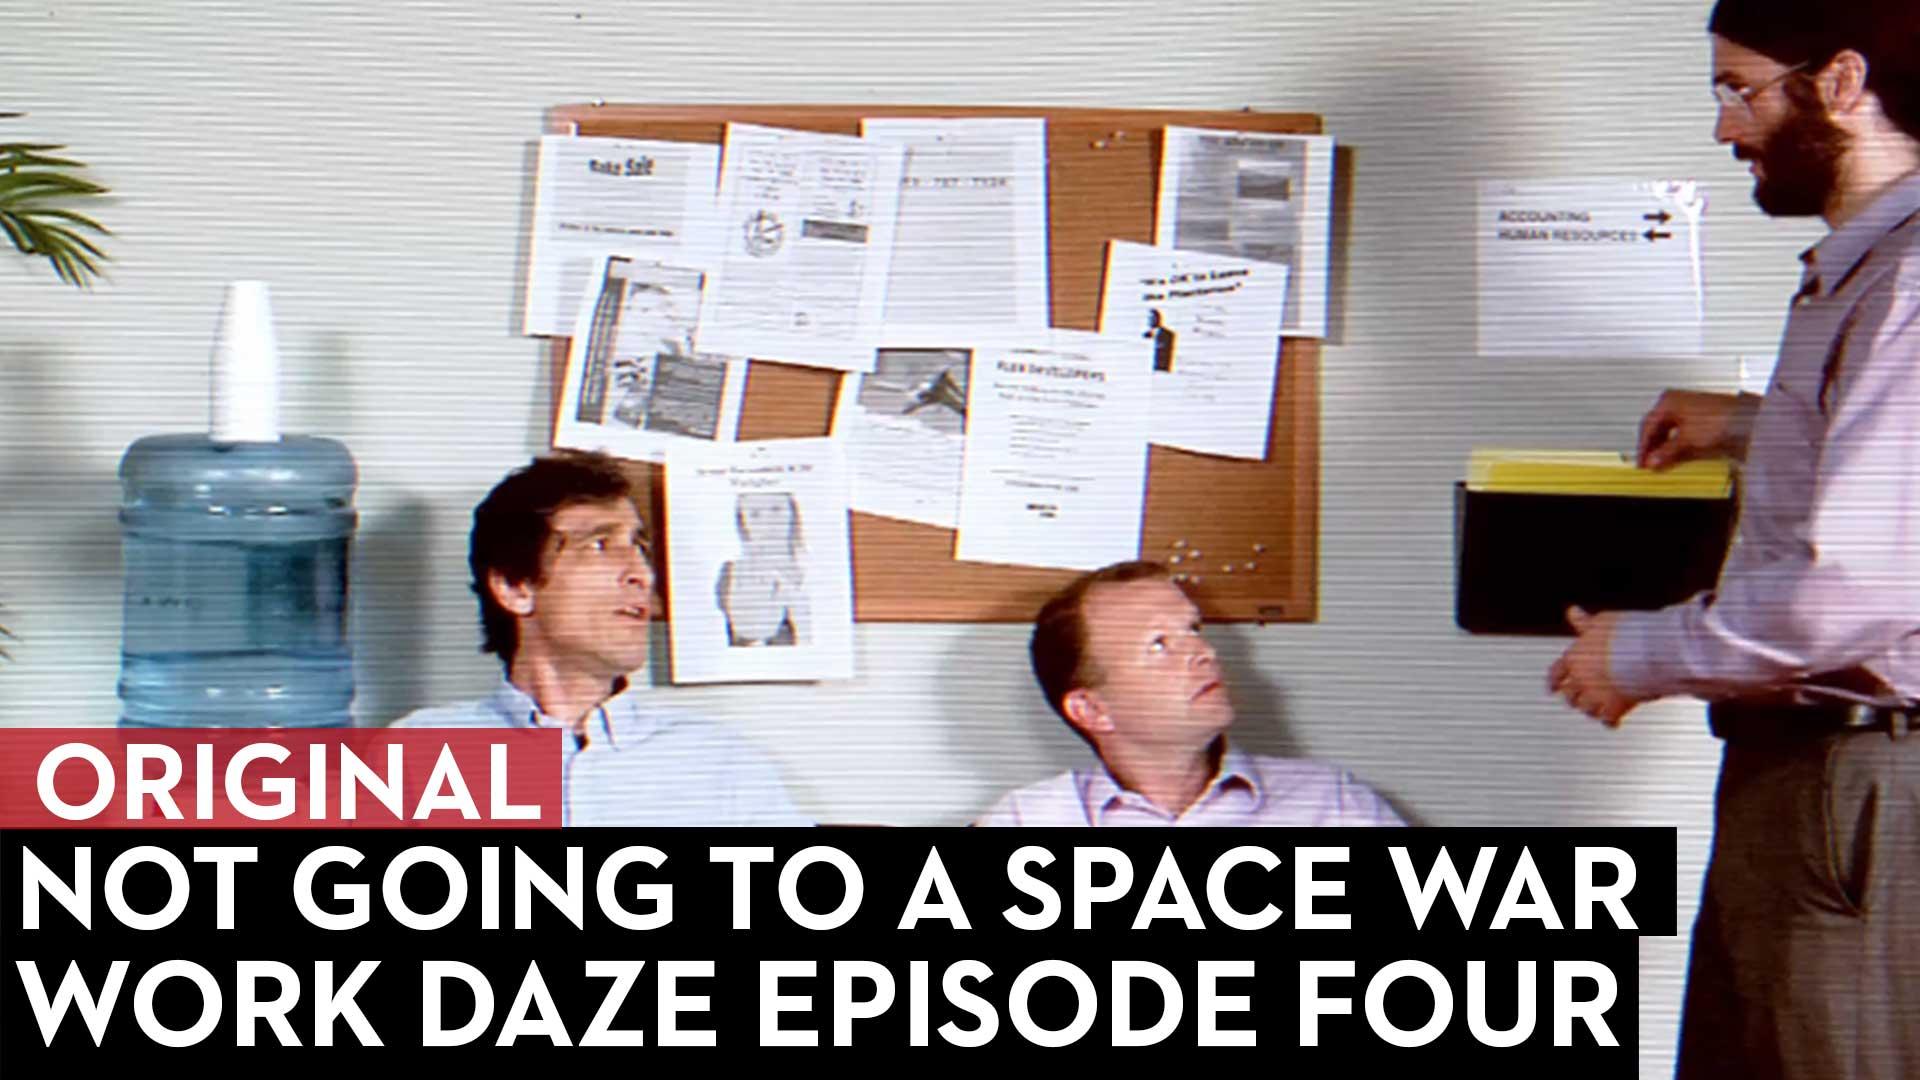 Work Daze Episode Four: Not Going to a Space War